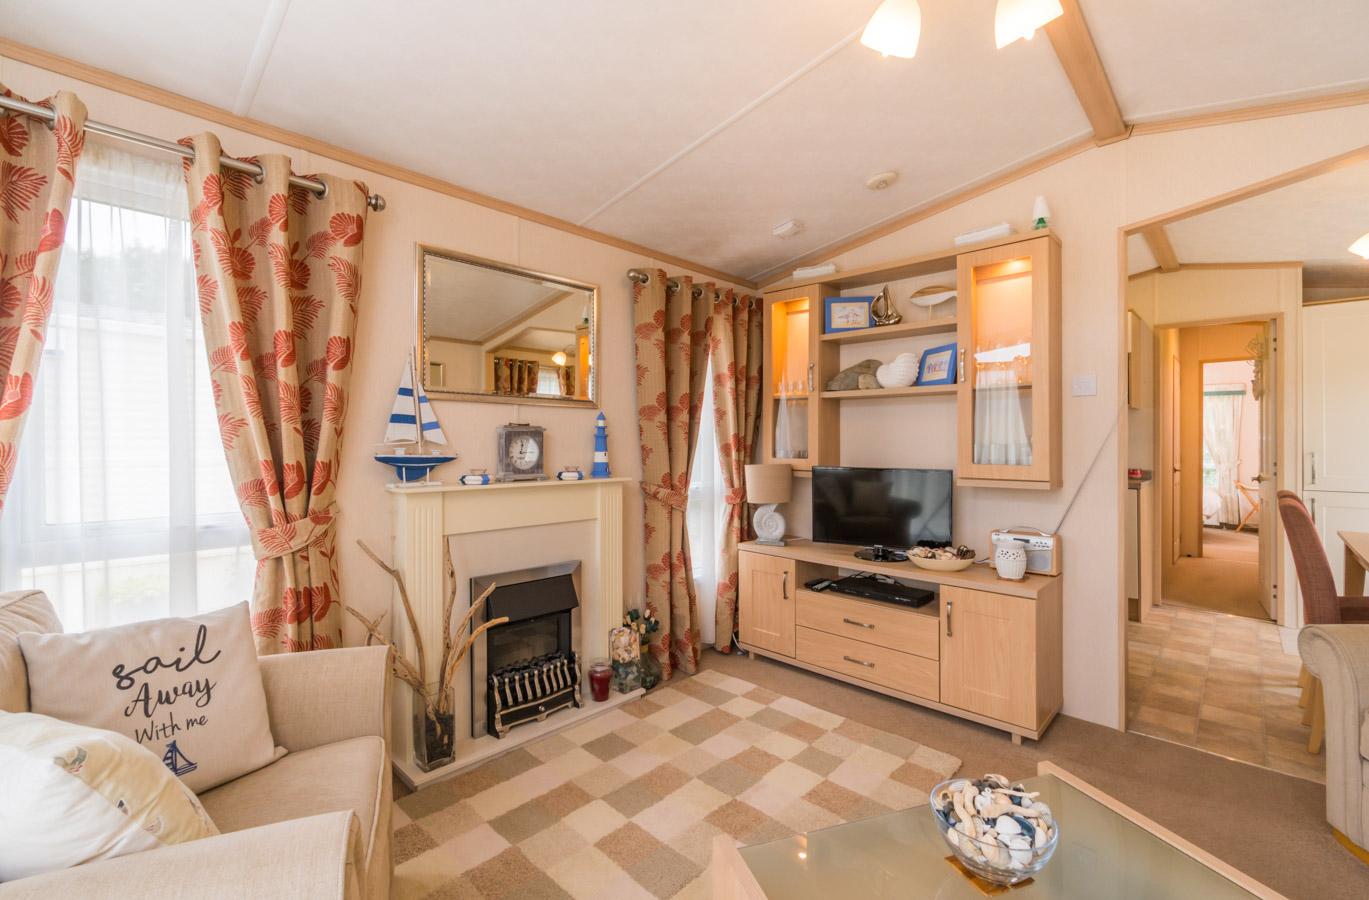 Neil-Bigwood-Monkton-Wyld-Holiday-Homes-11